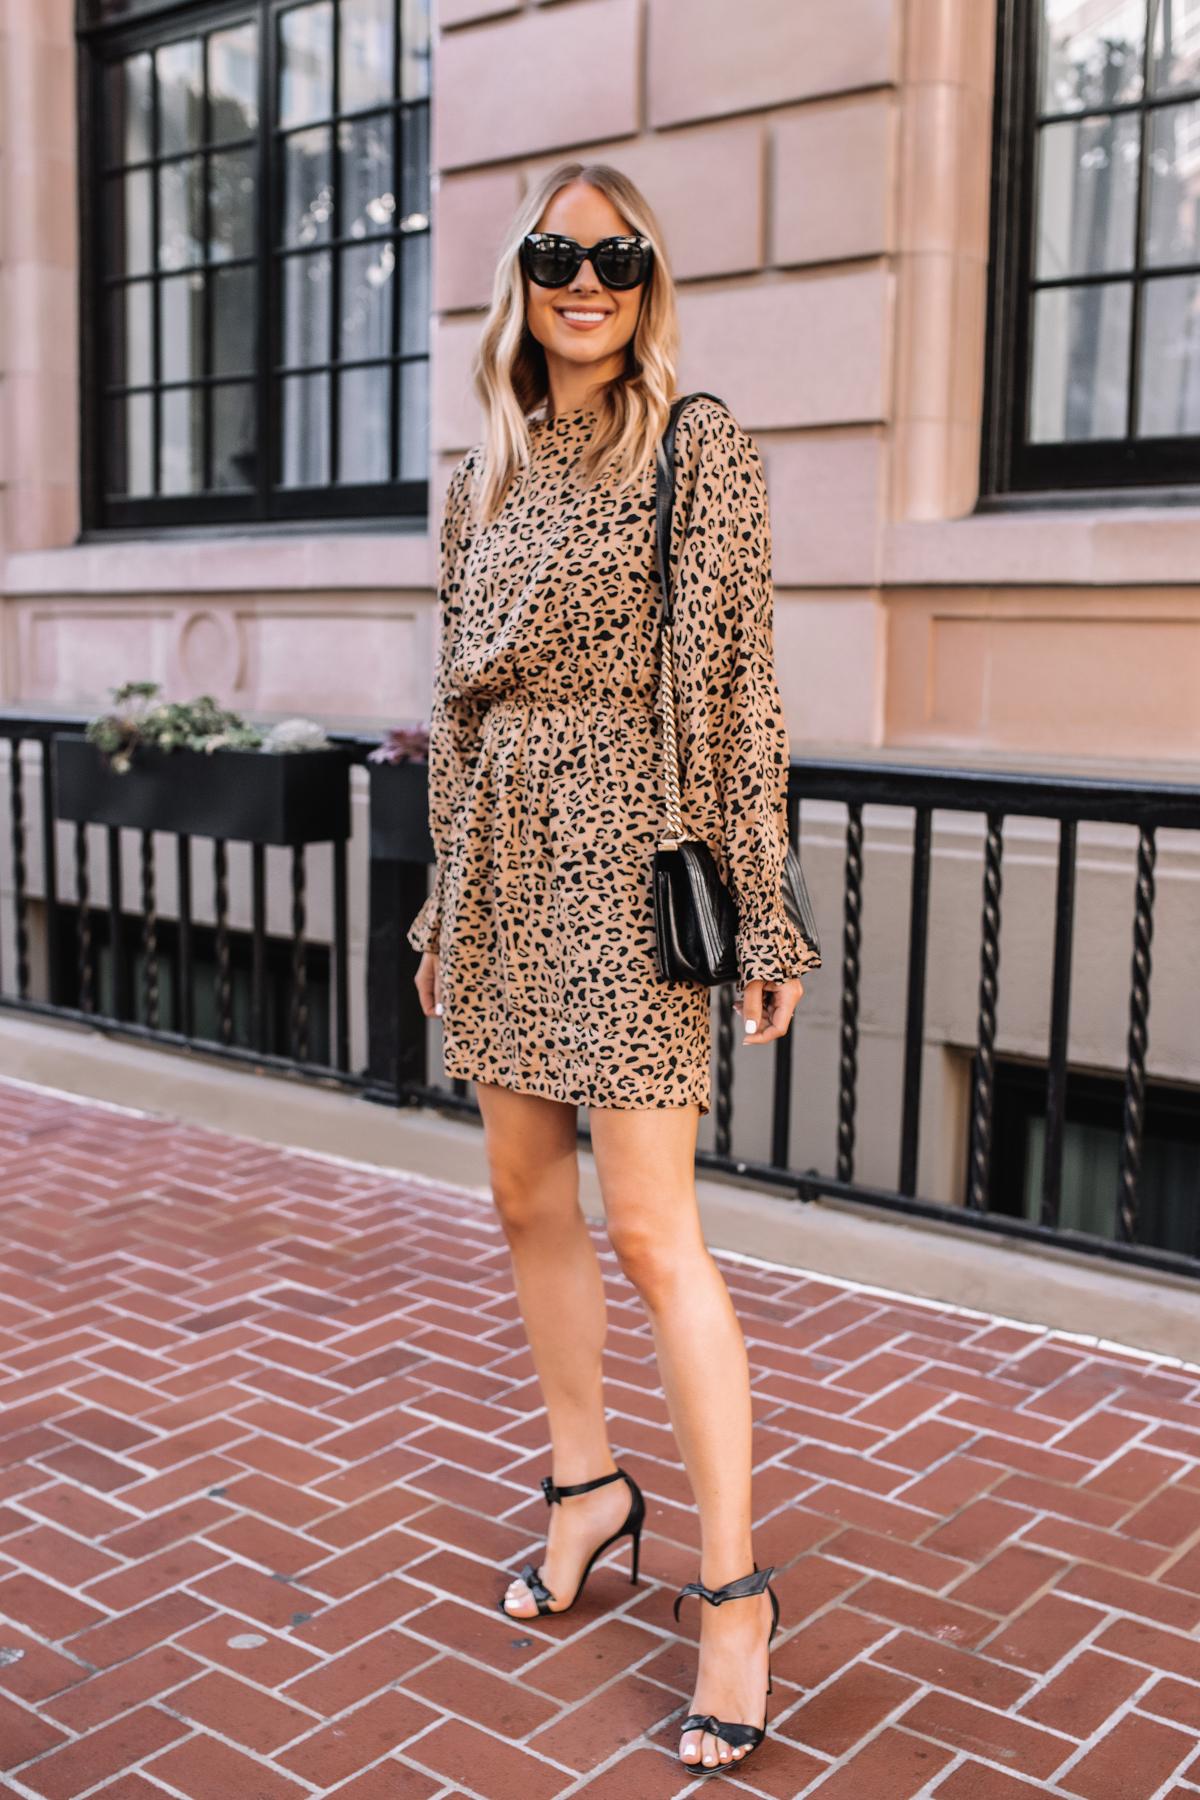 Fashion Jackson Wearing Baum und Pferdgarten Aemiley Drape Leopard Mini Dress Black Heeled Sandals Black Handbag 1